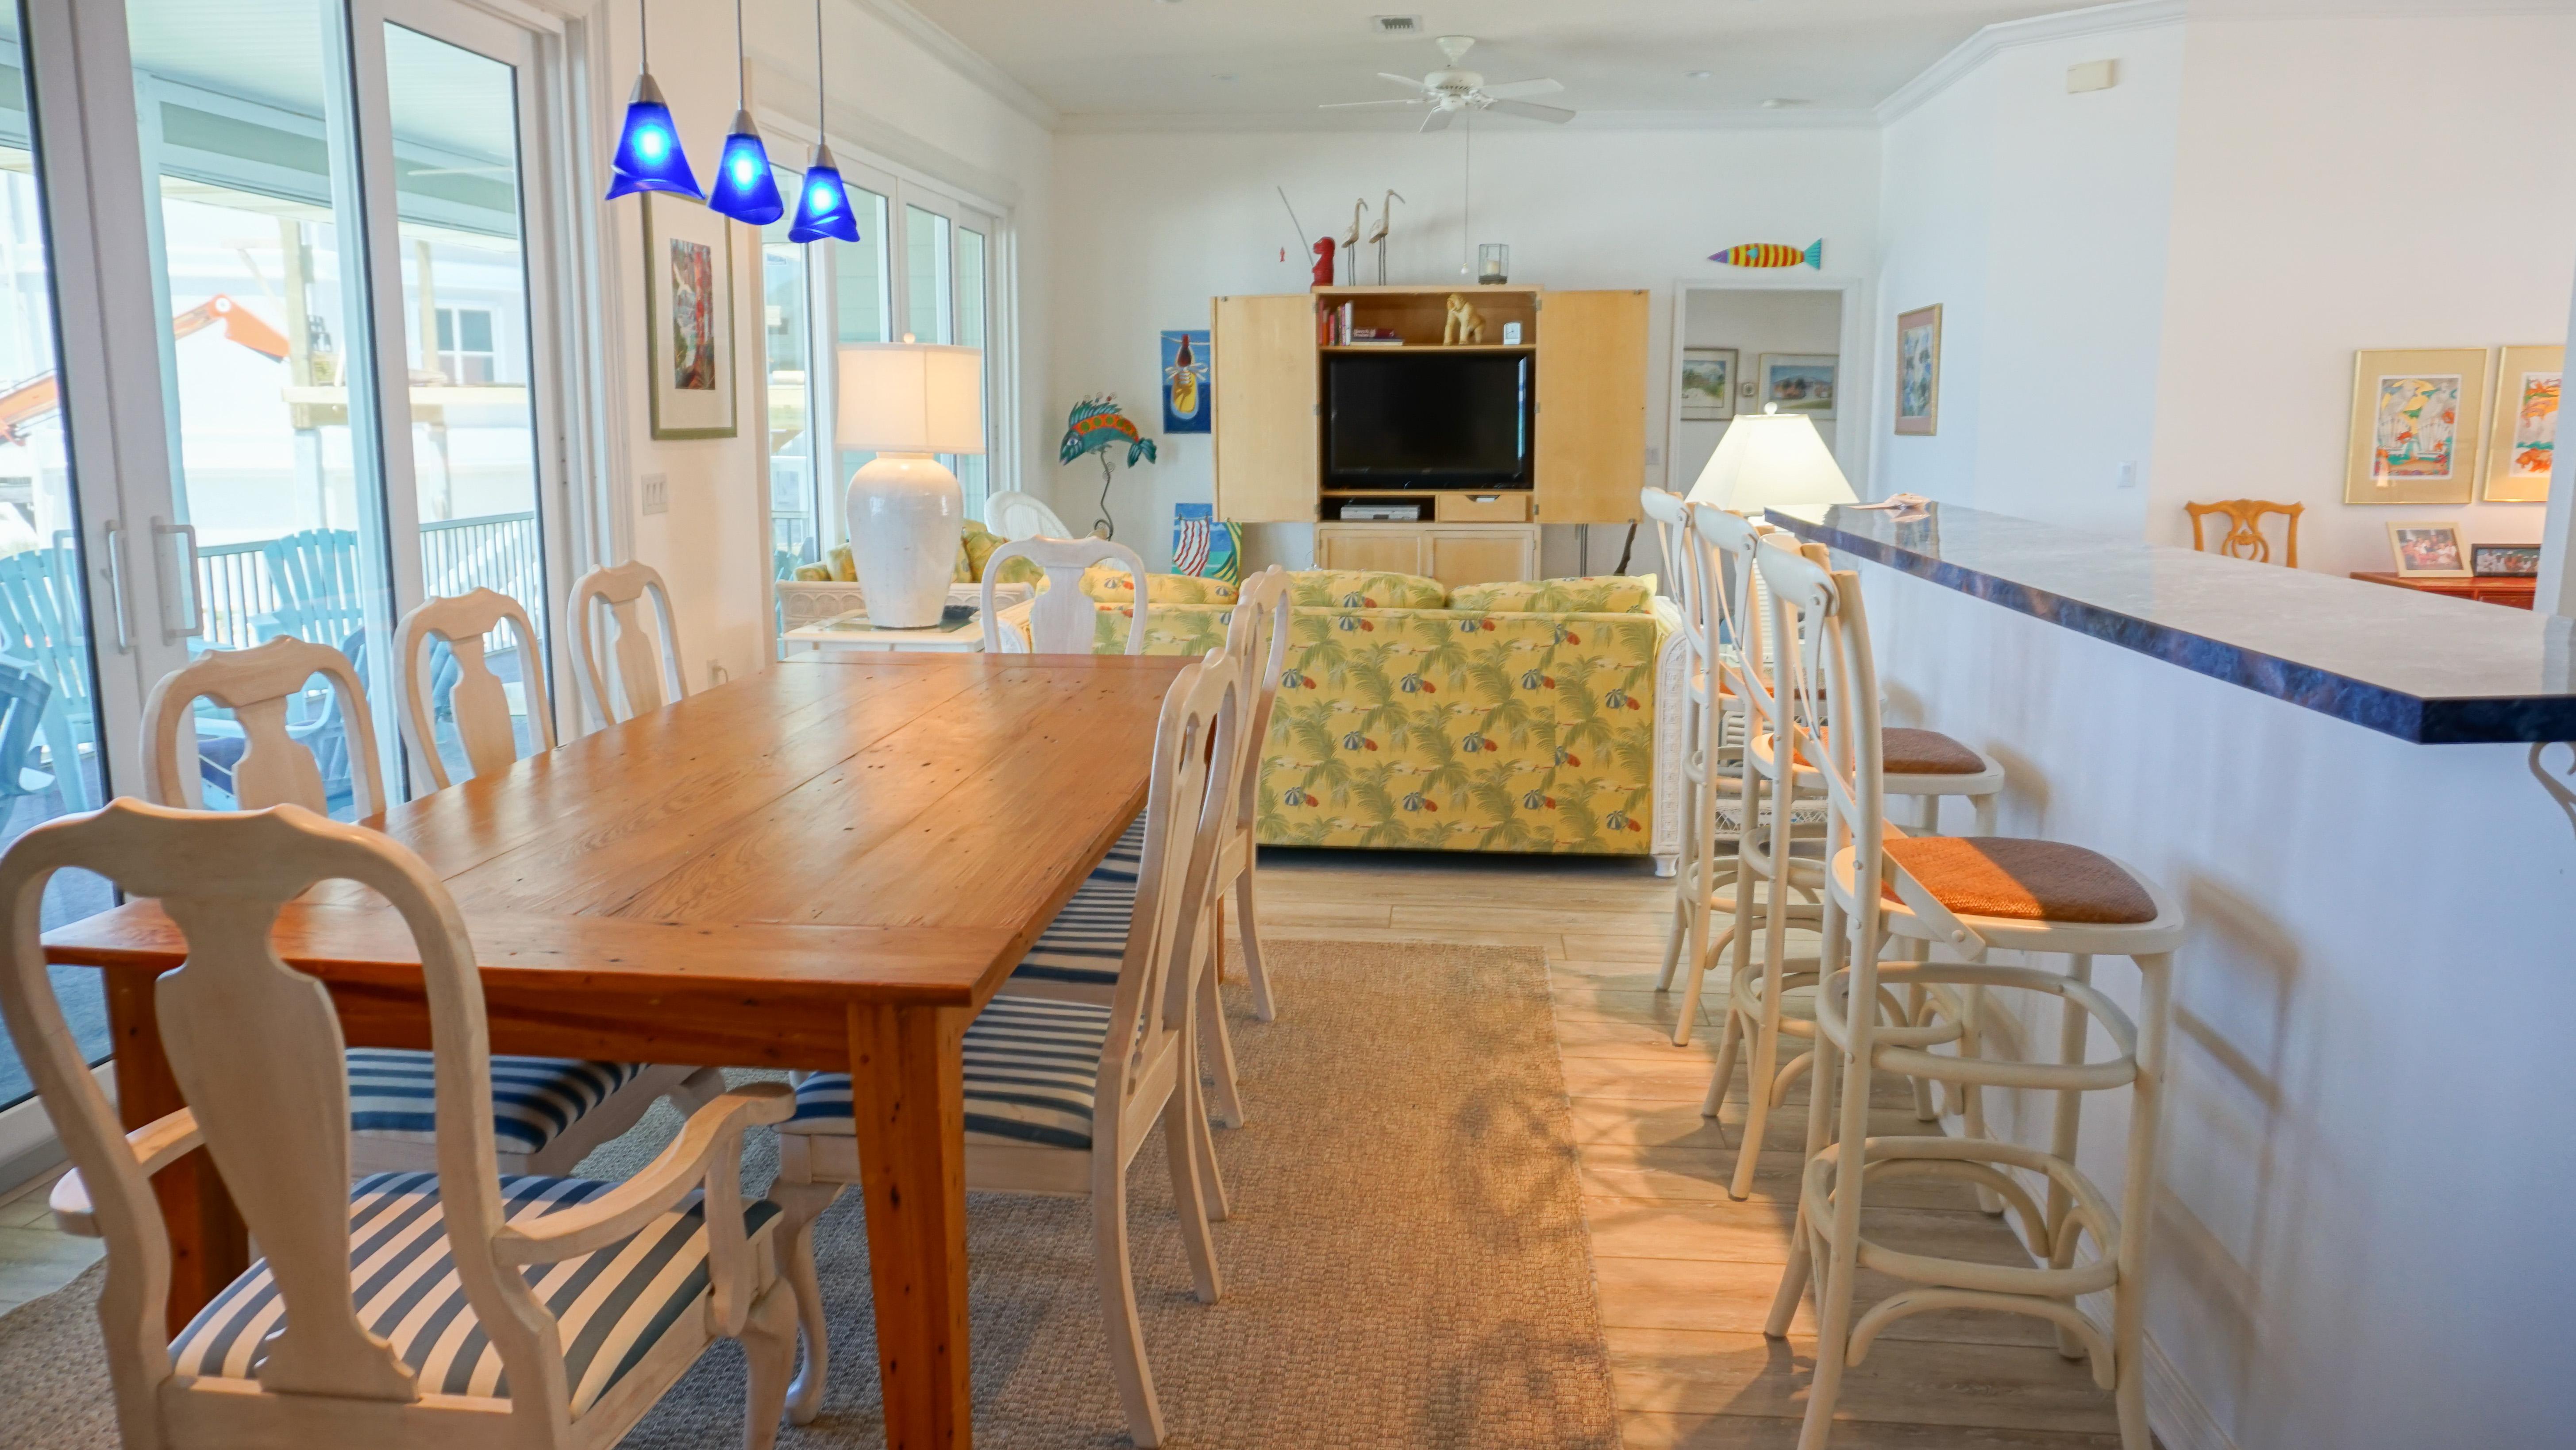 Ensenada Cinco 1730 House/Cottage rental in Pensacola Beach House Rentals in Pensacola Beach Florida - #30